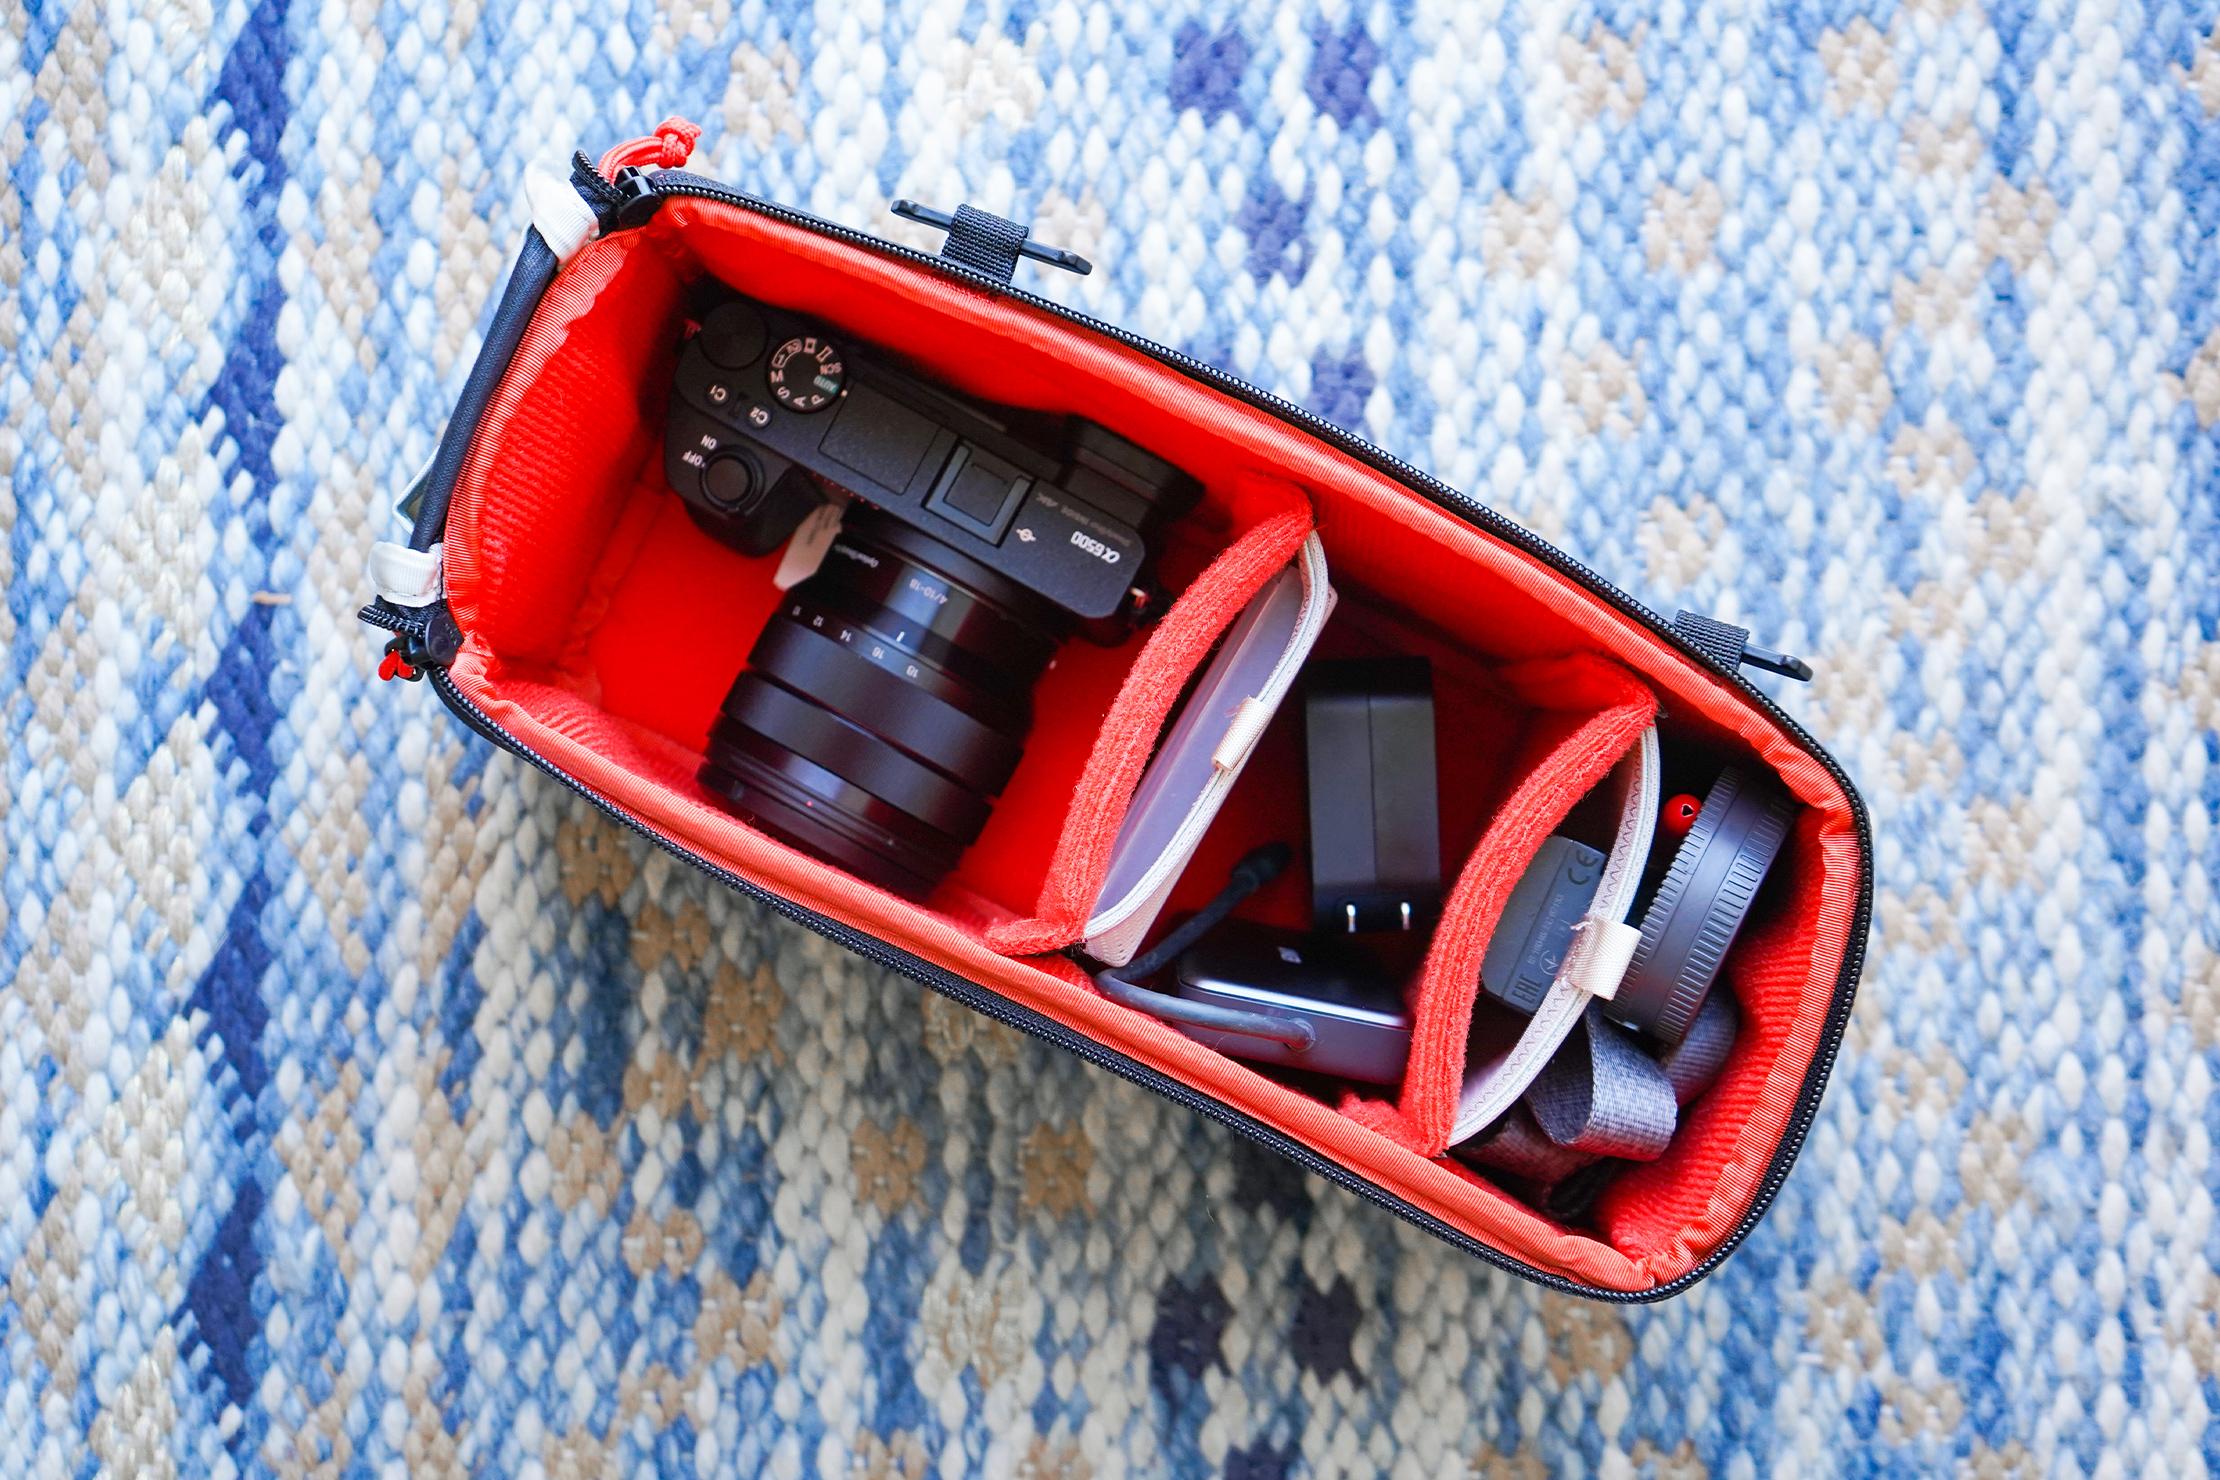 Moment MTW Camera Insert 5L | Using the camera cube in the studio